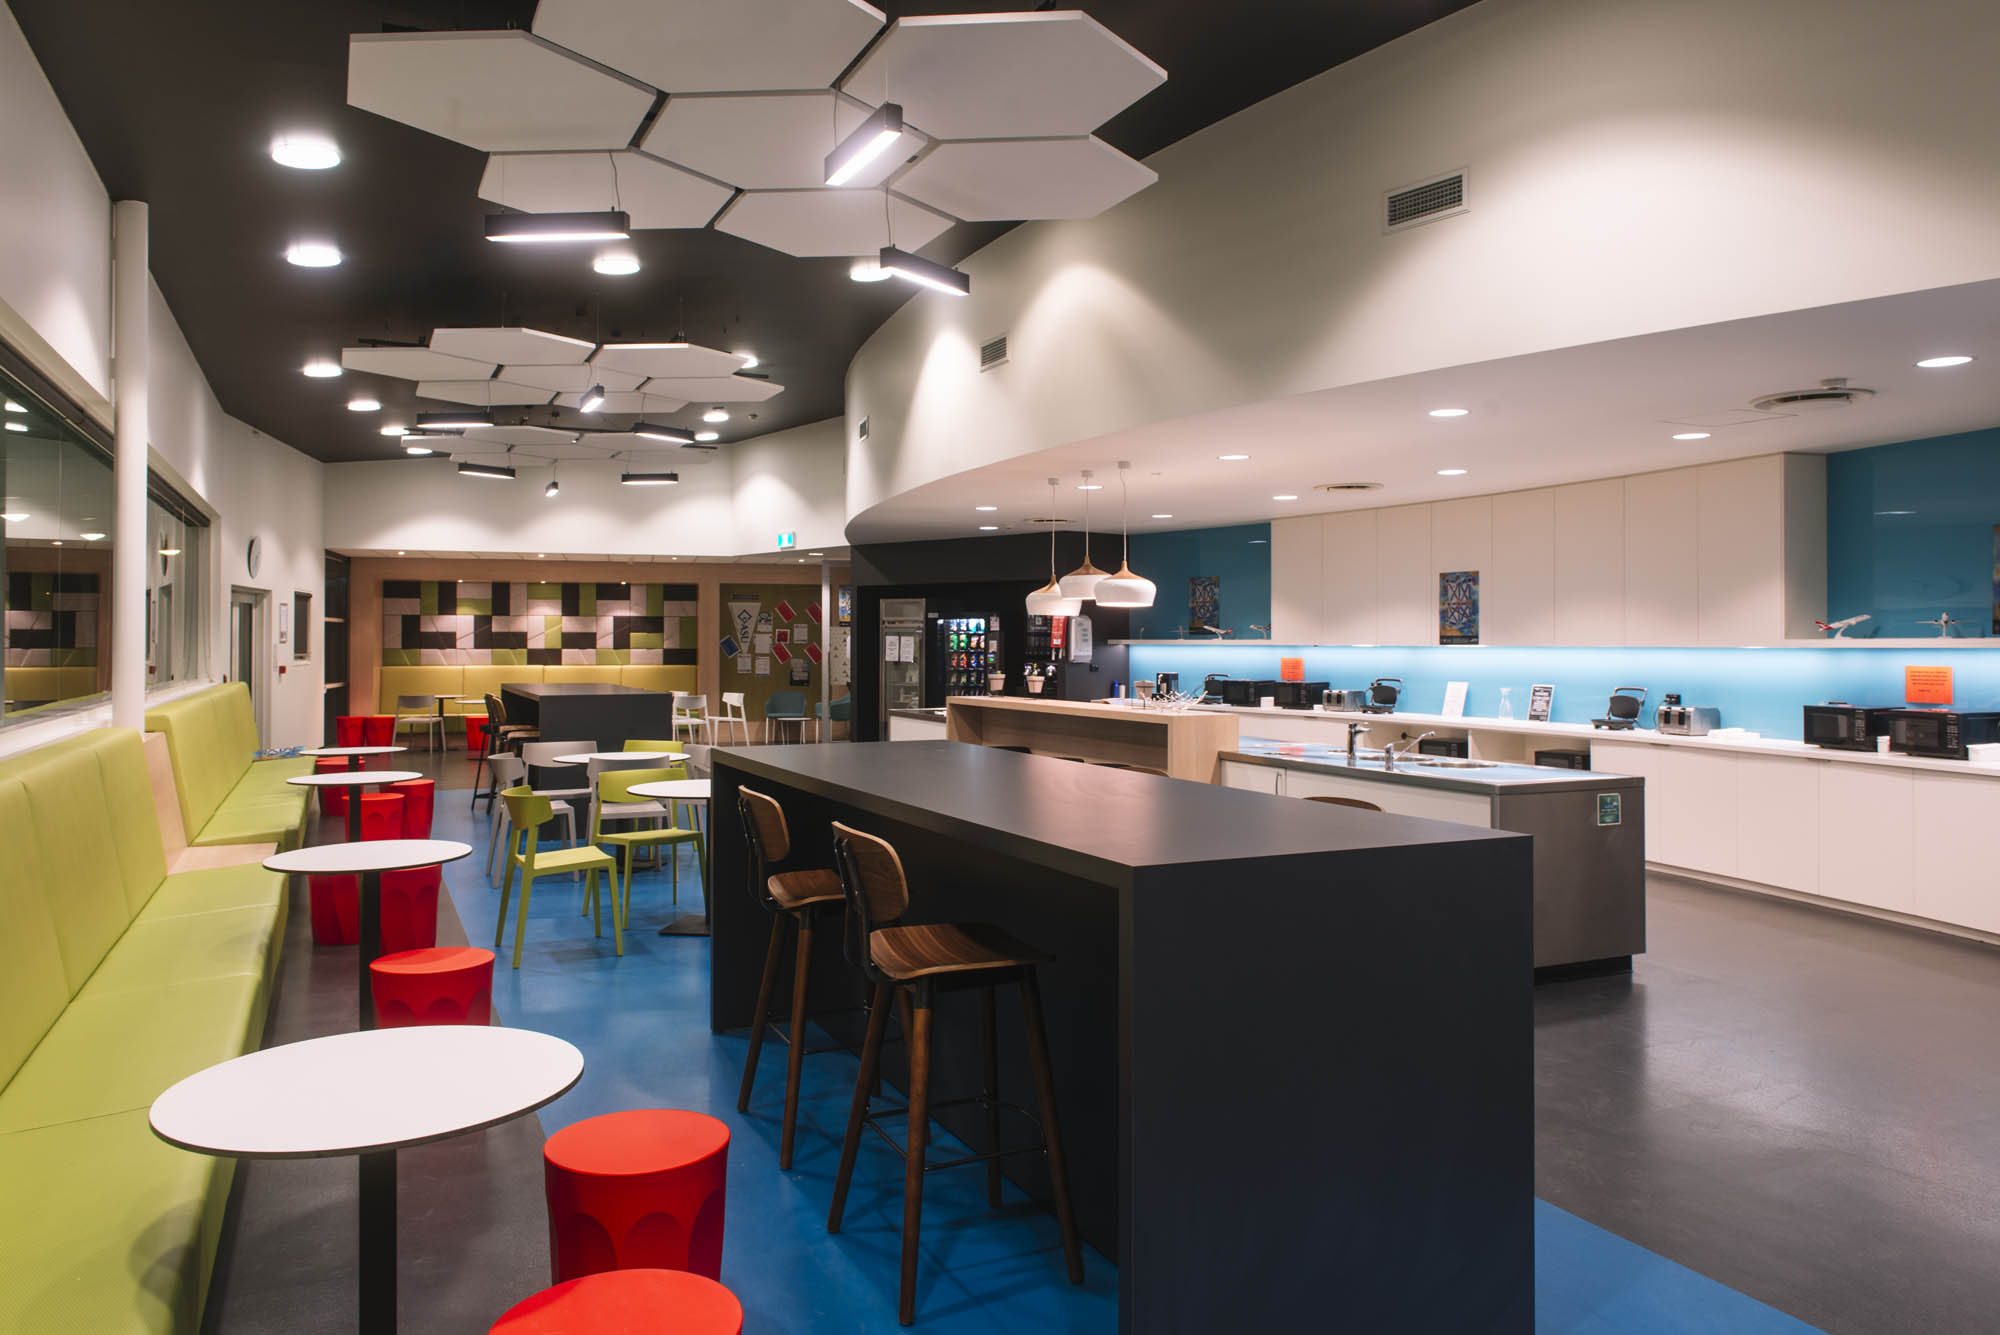 qantas hobart office fitout kitchen